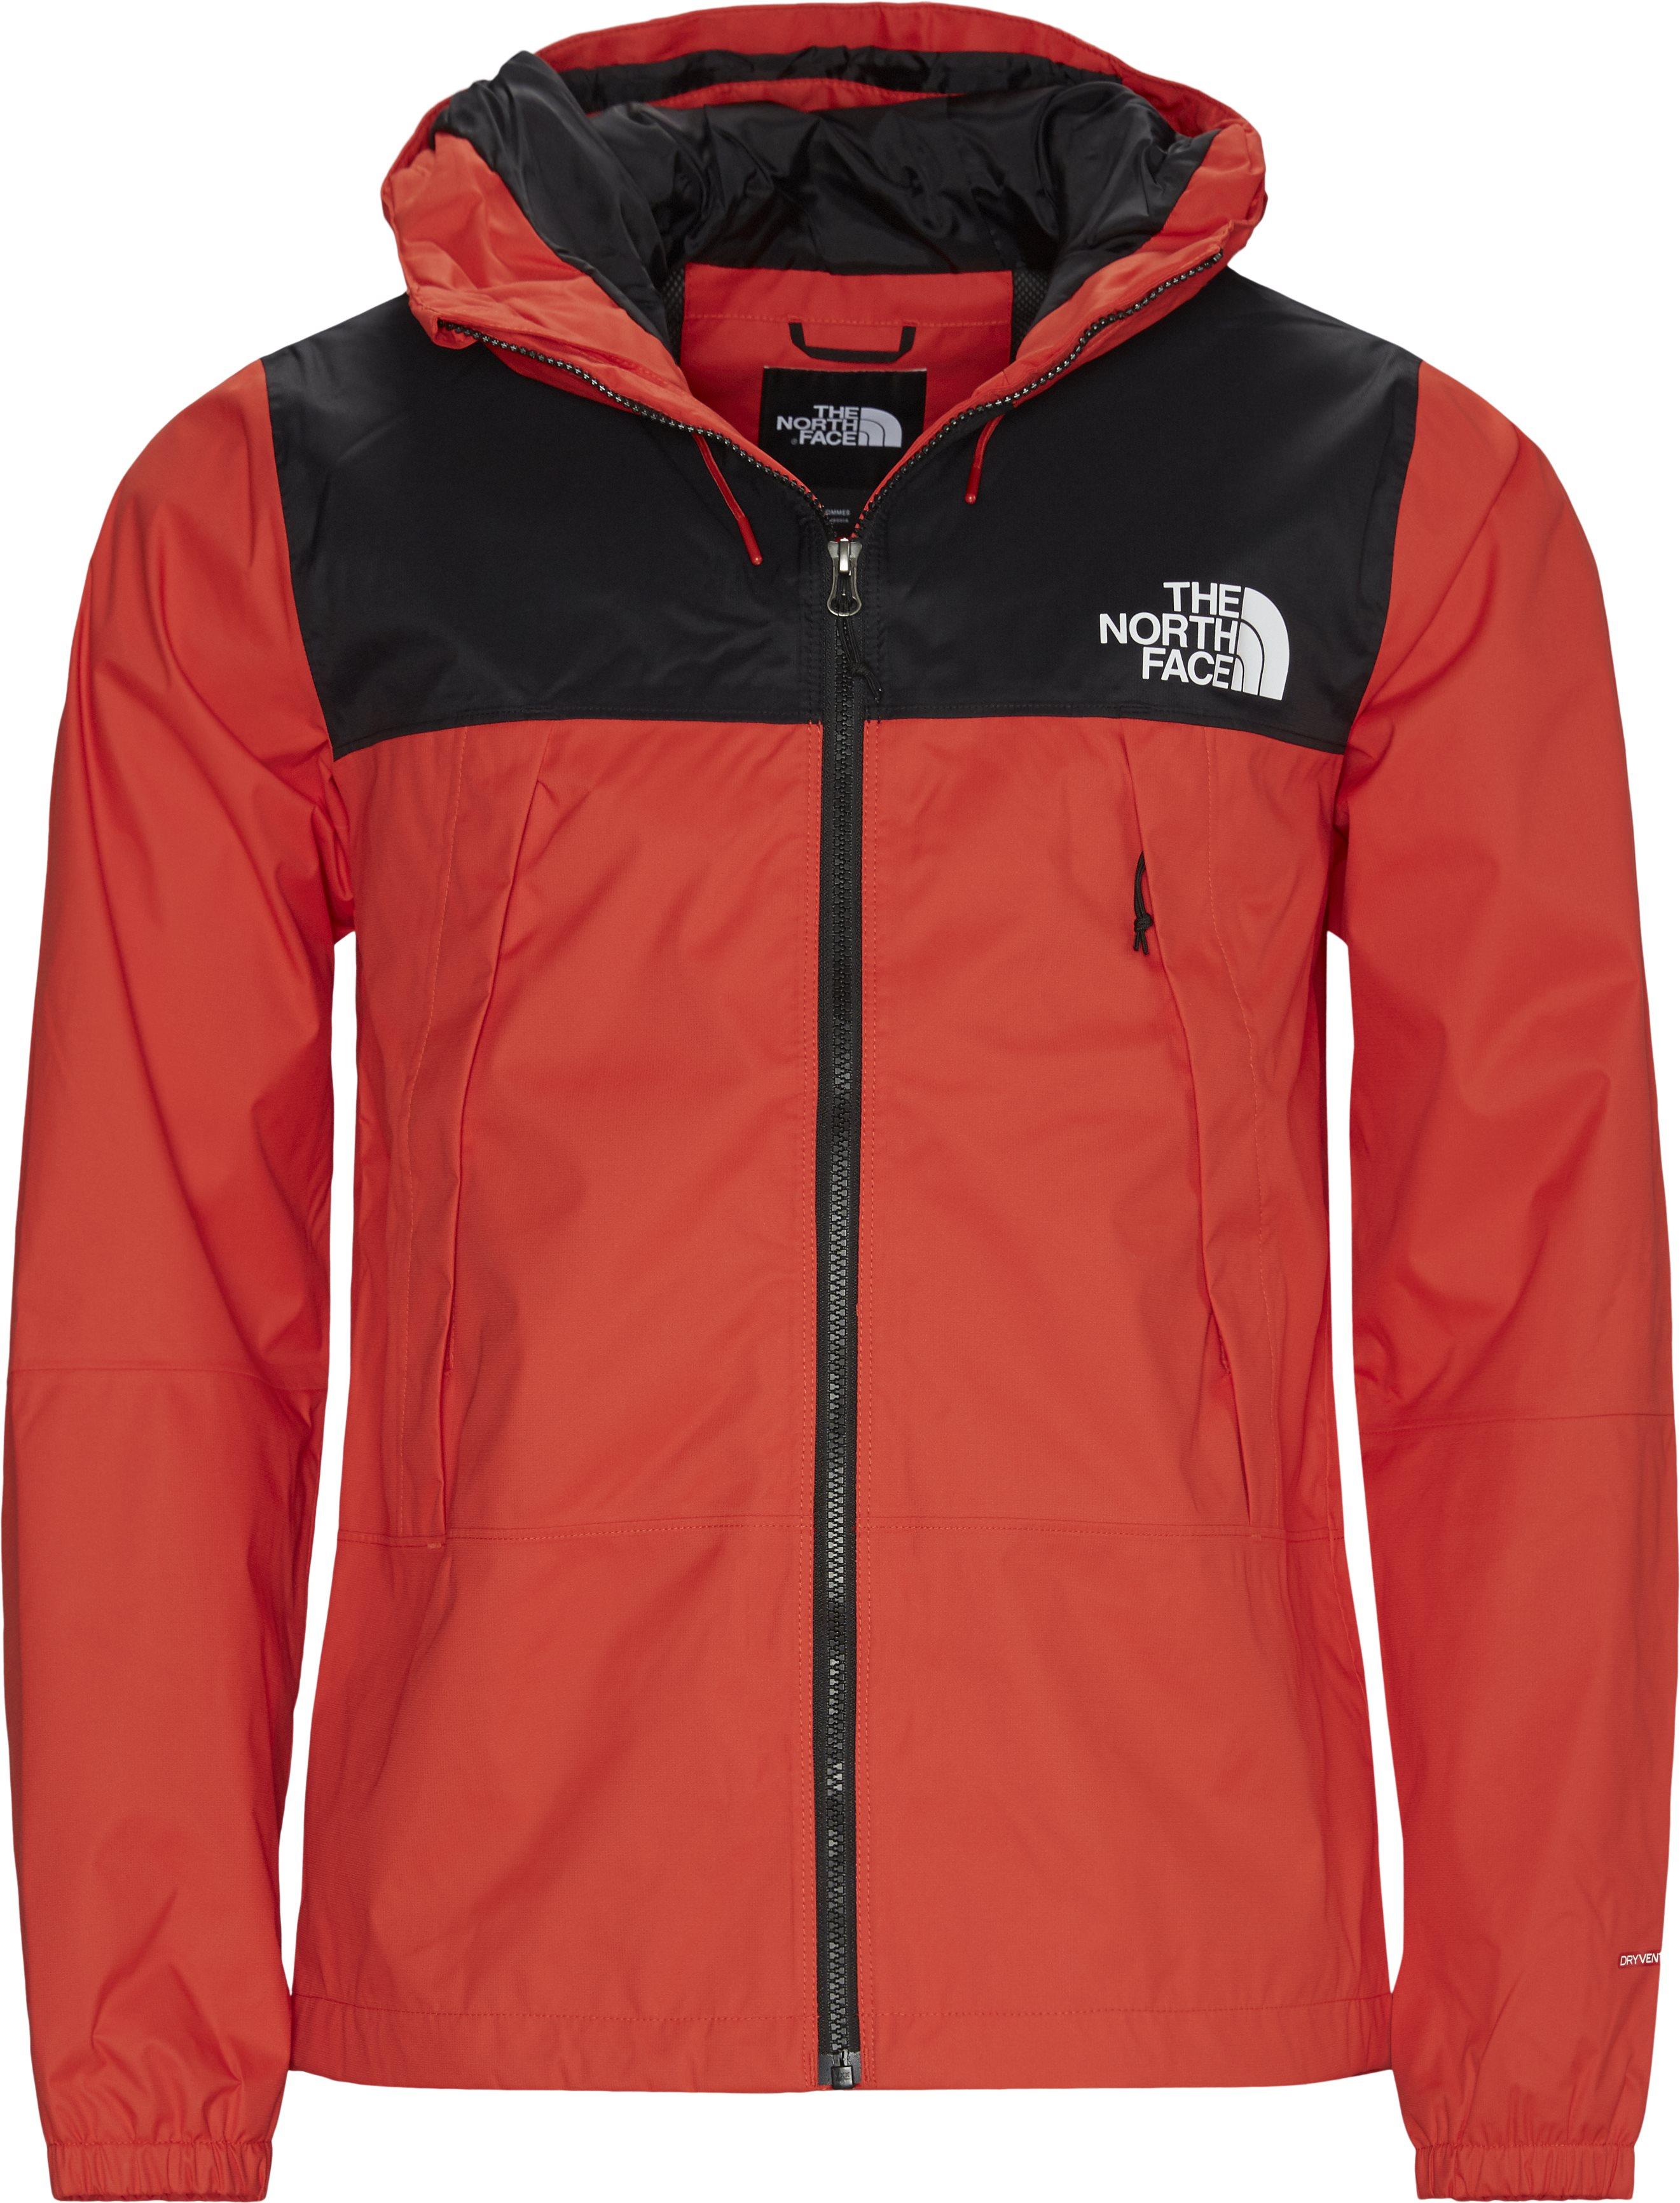 1990 Mountain Jacket - Jakker - Regular - Rød